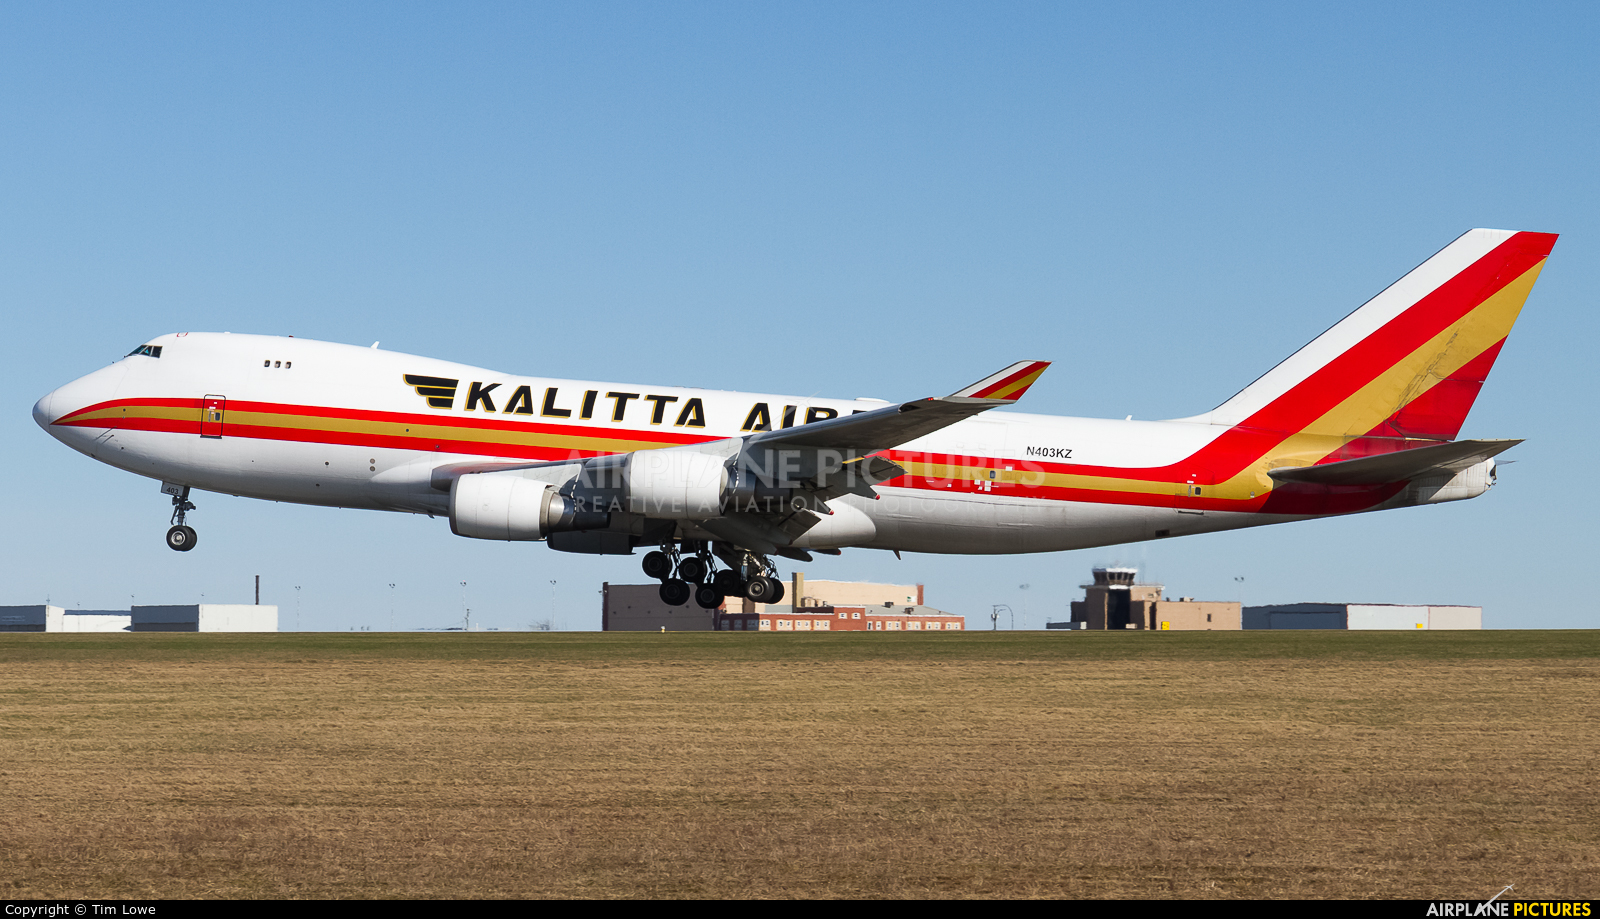 Kalitta Air N403KZ aircraft at greater Moncton International